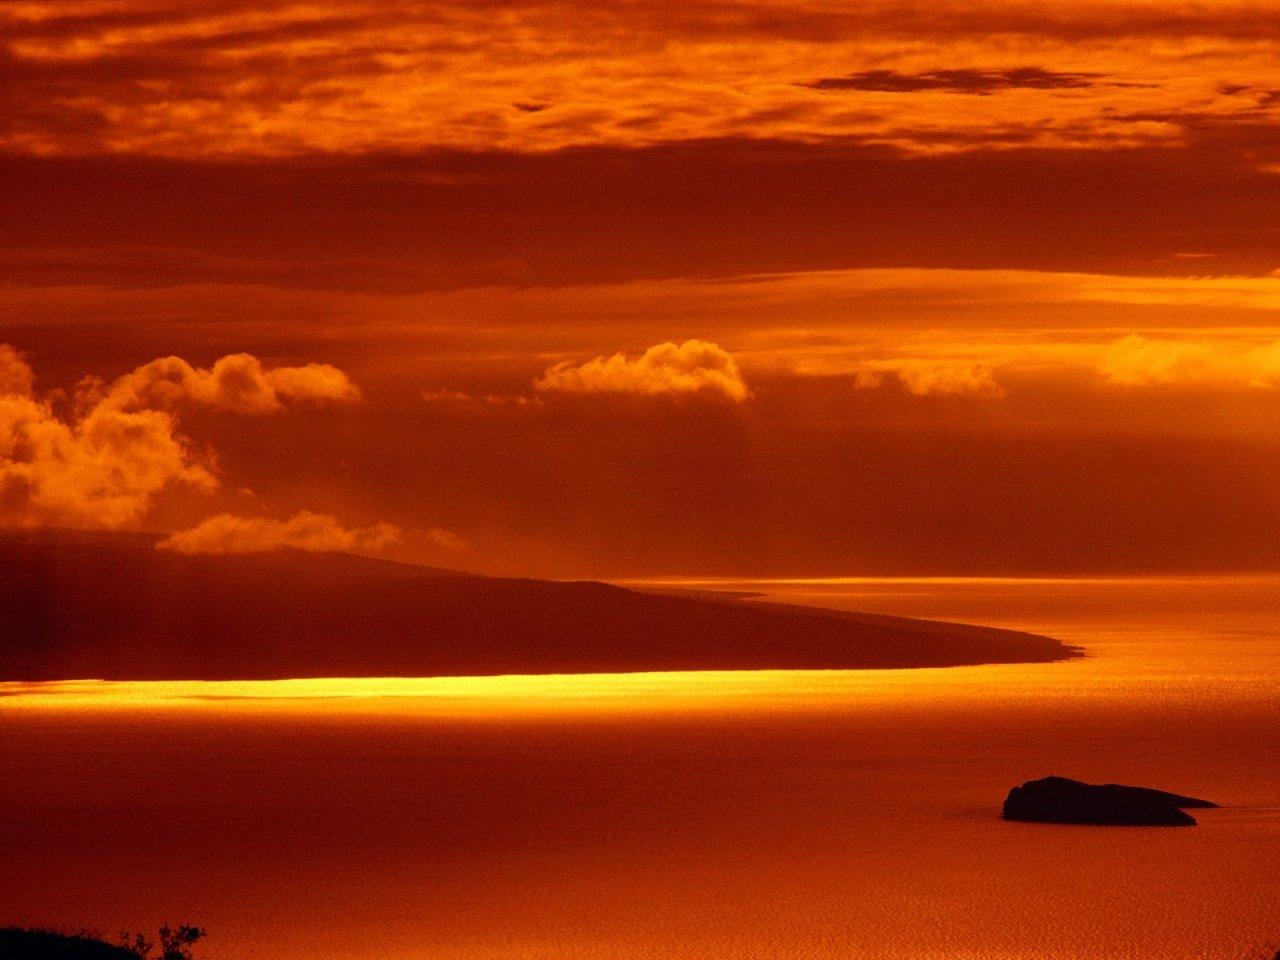 1280x1024 Hawaii Hot Sunset desktop PC and Mac wallpaper 1280x960